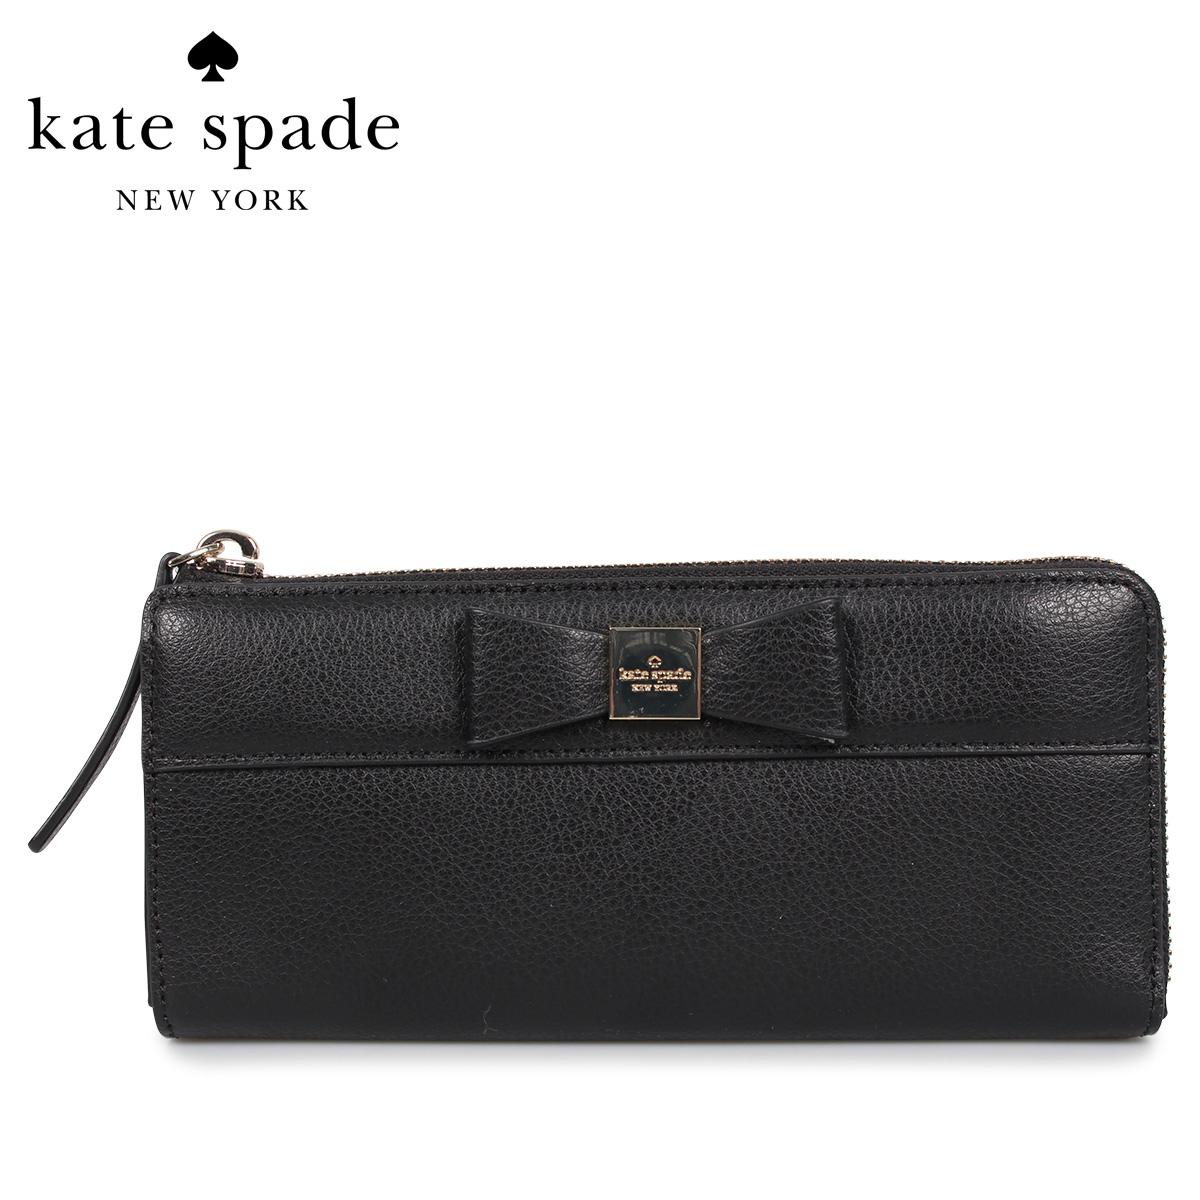 kate spade ケイトスペード 財布 長財布 レディース NISHA ブラック 黒 WLRU4967 [3/13 新入荷]